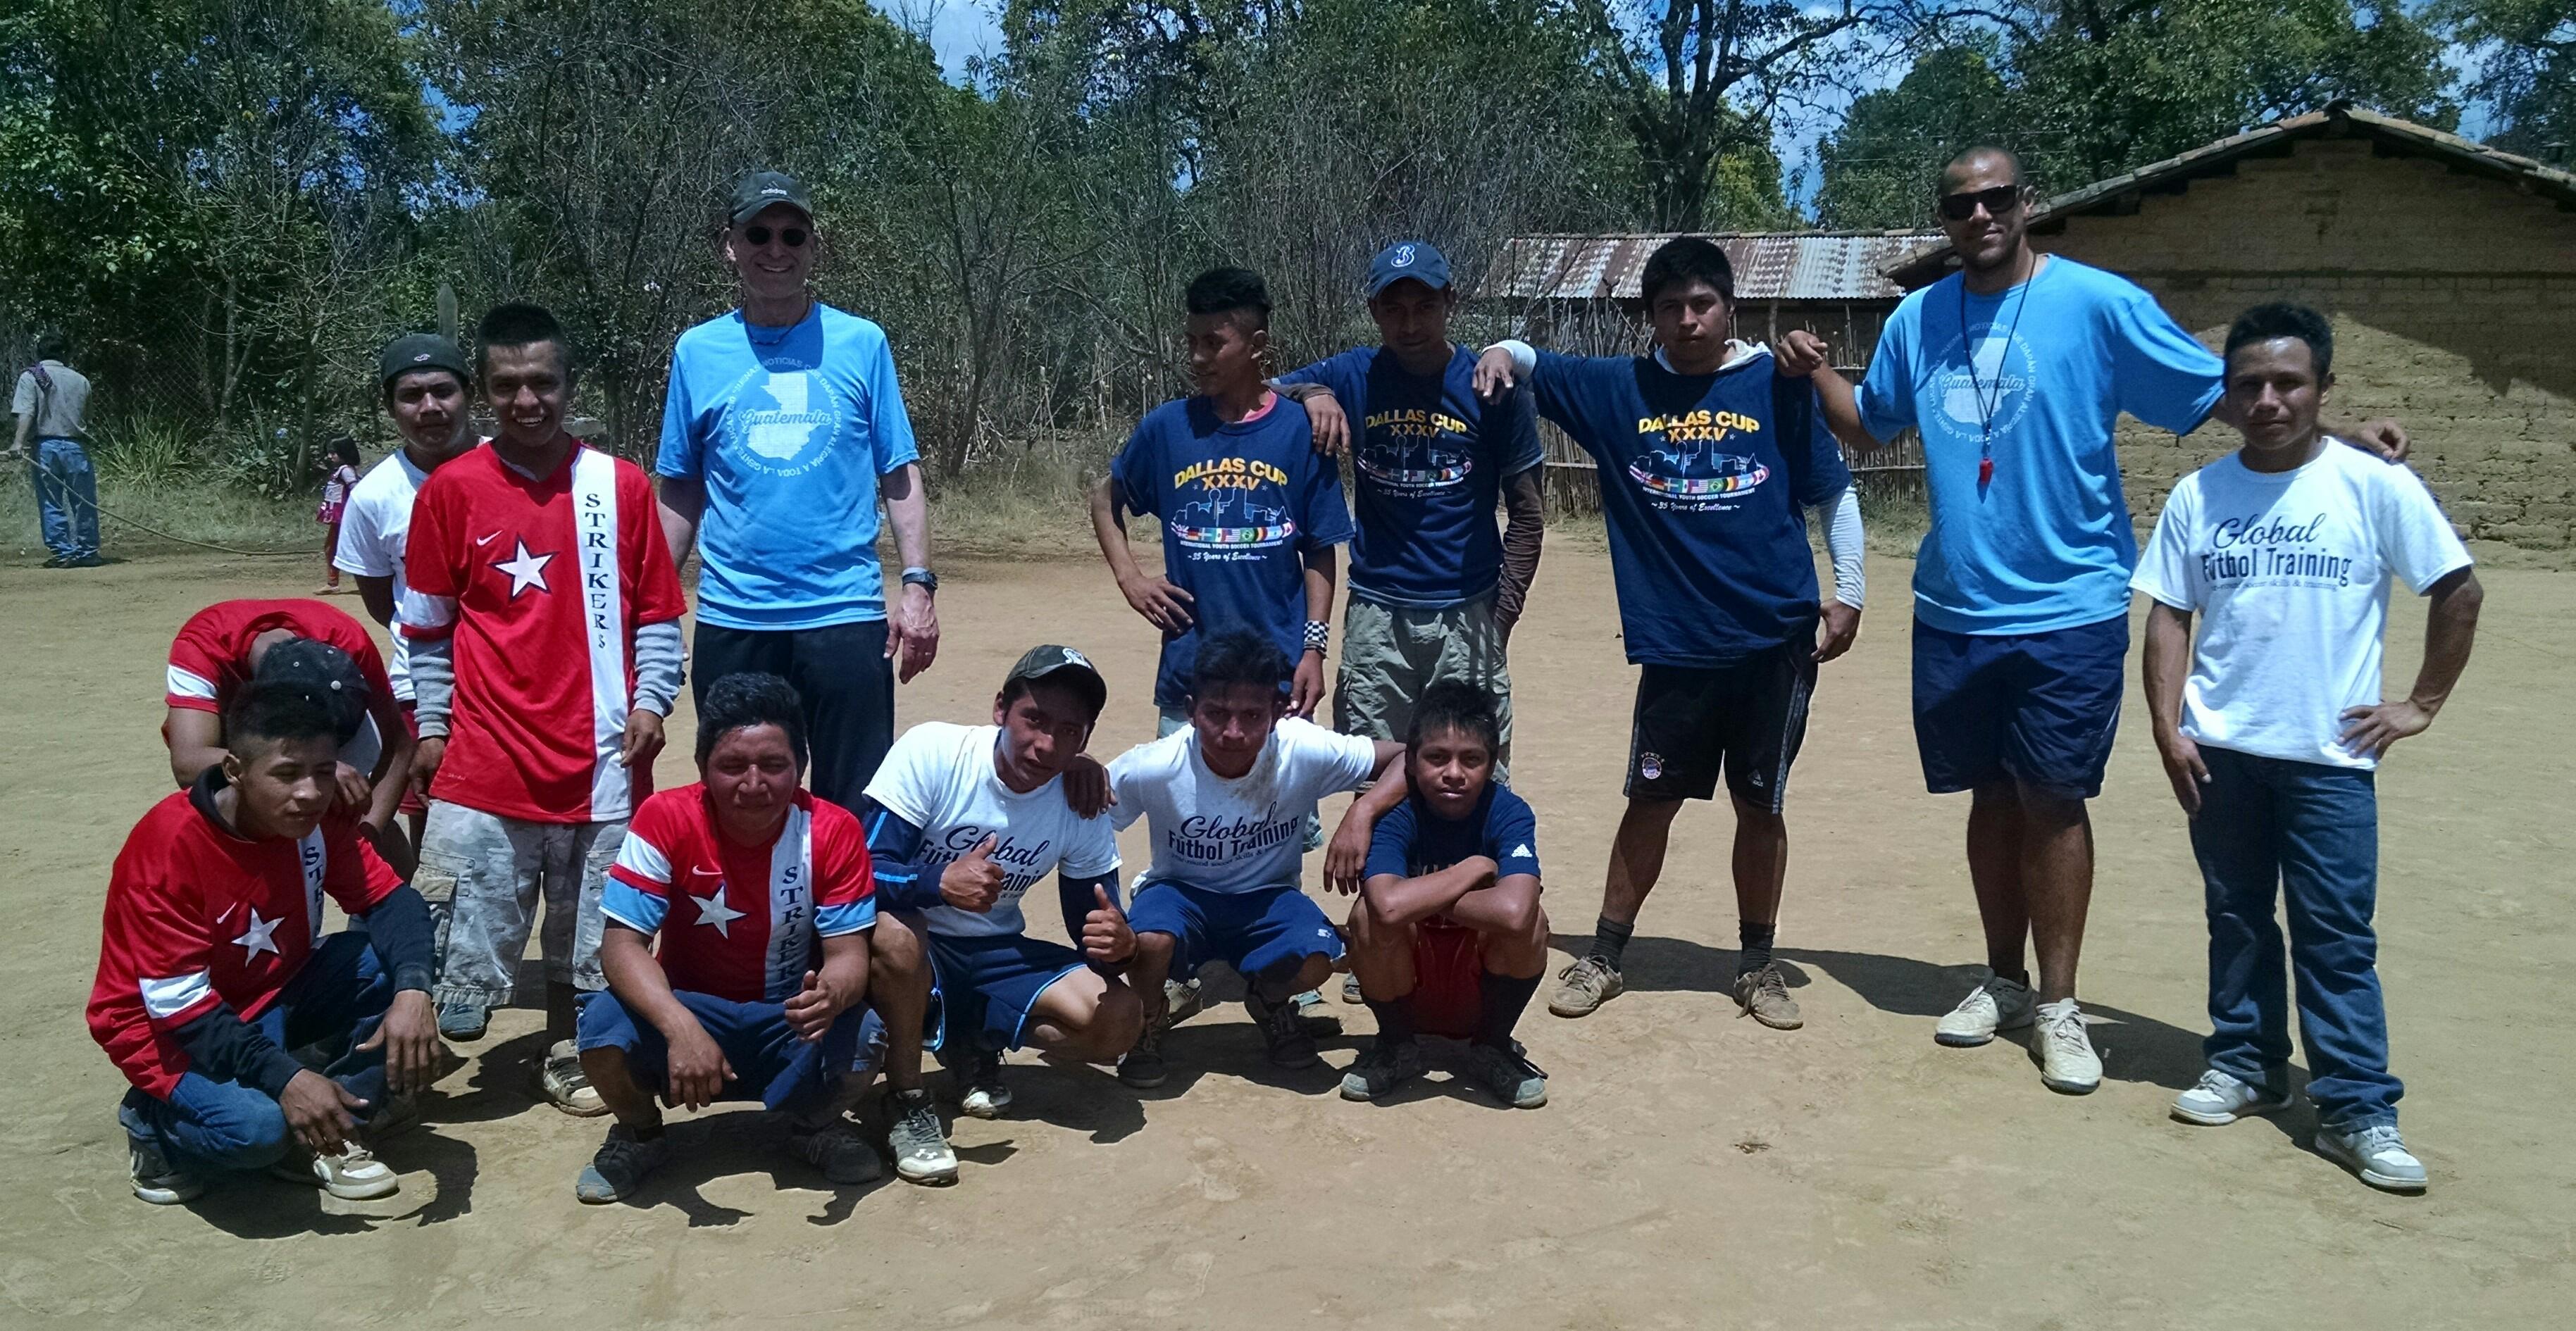 Global Futbol Training Guatemala GFTskills camp Jeremie Piette soccer skills trainer coach